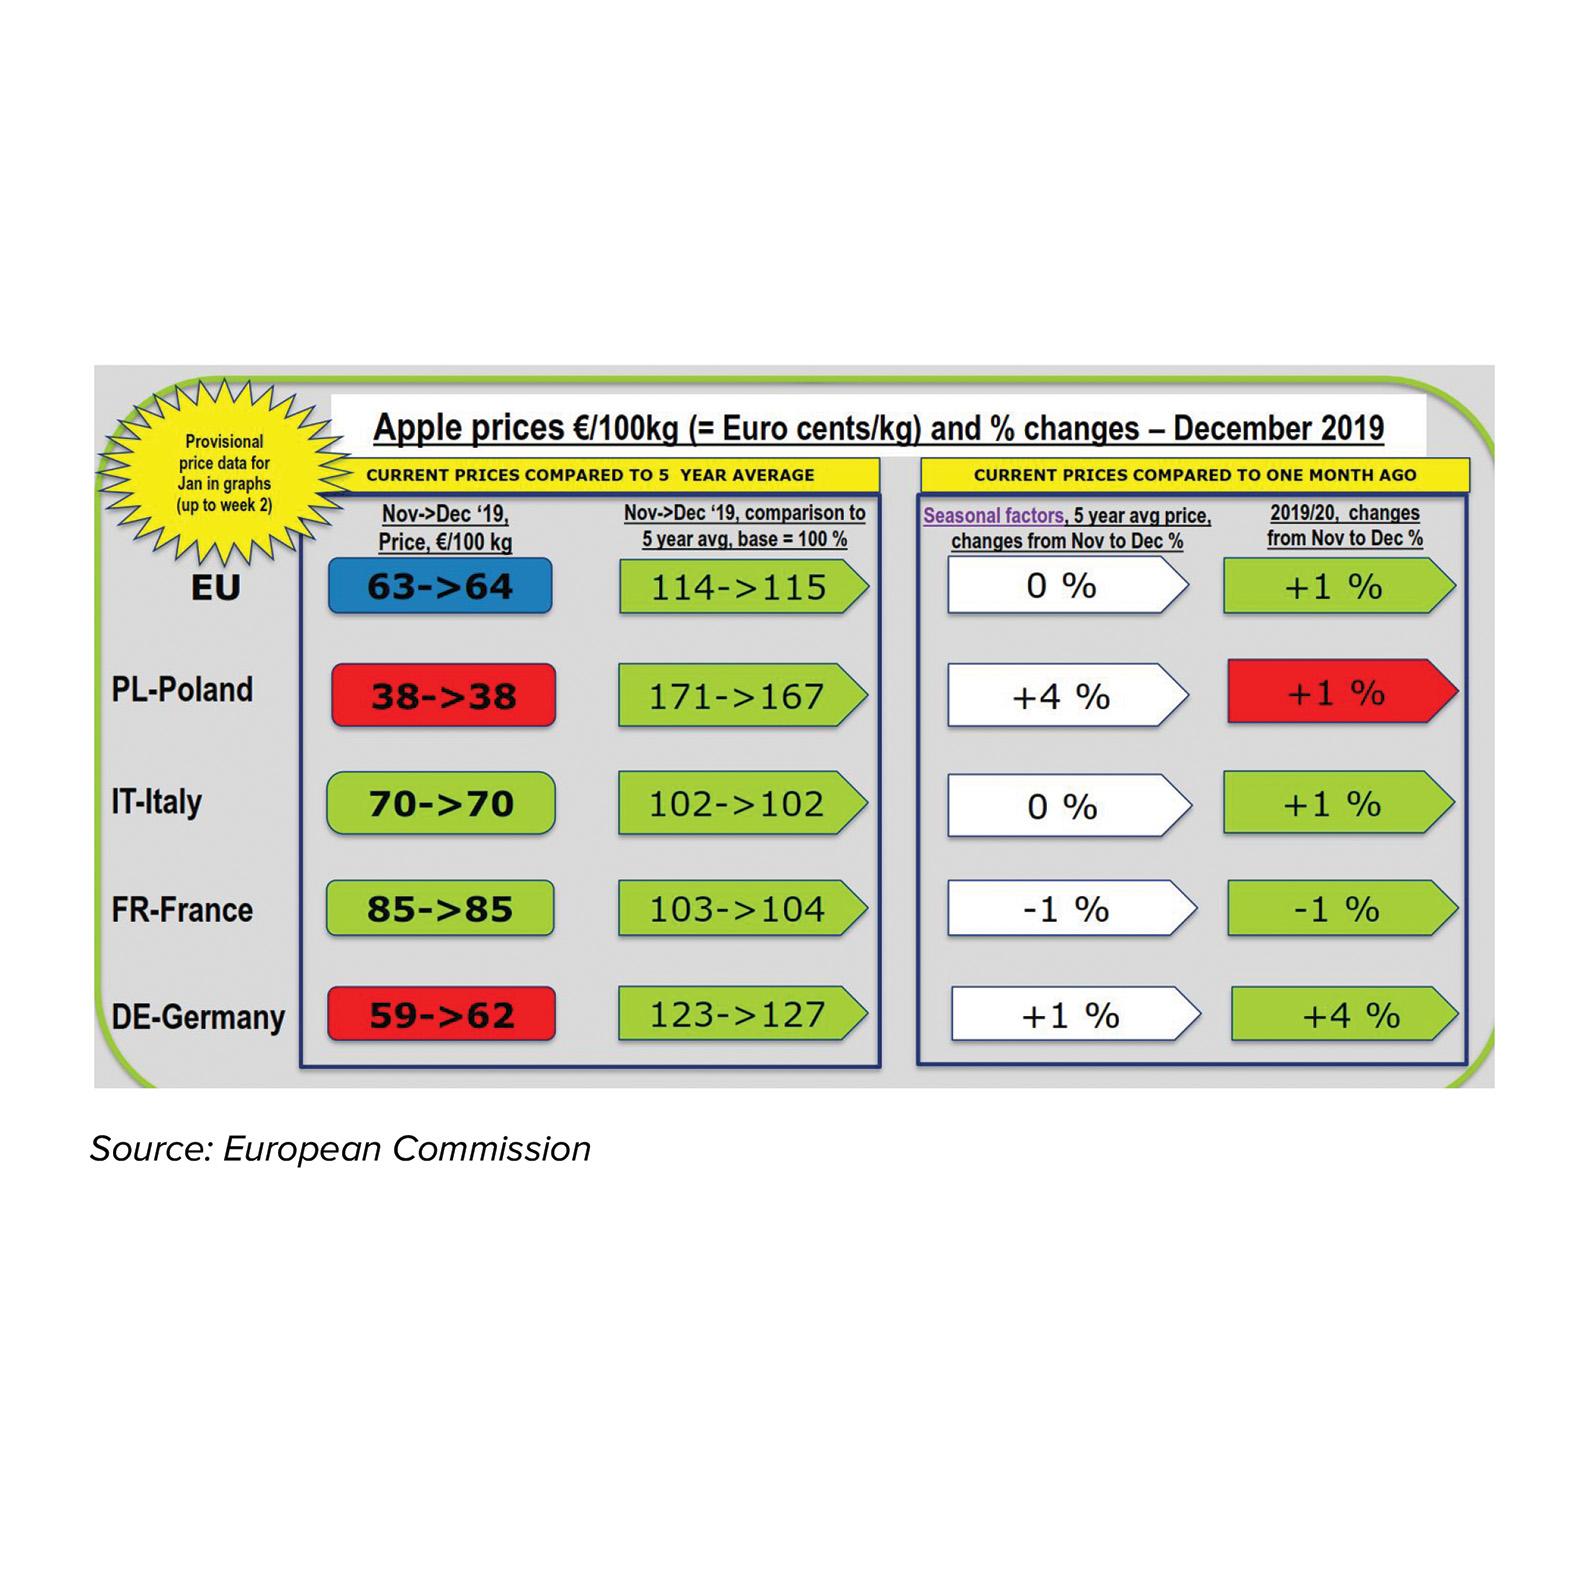 Recovery of EU apple prices this season